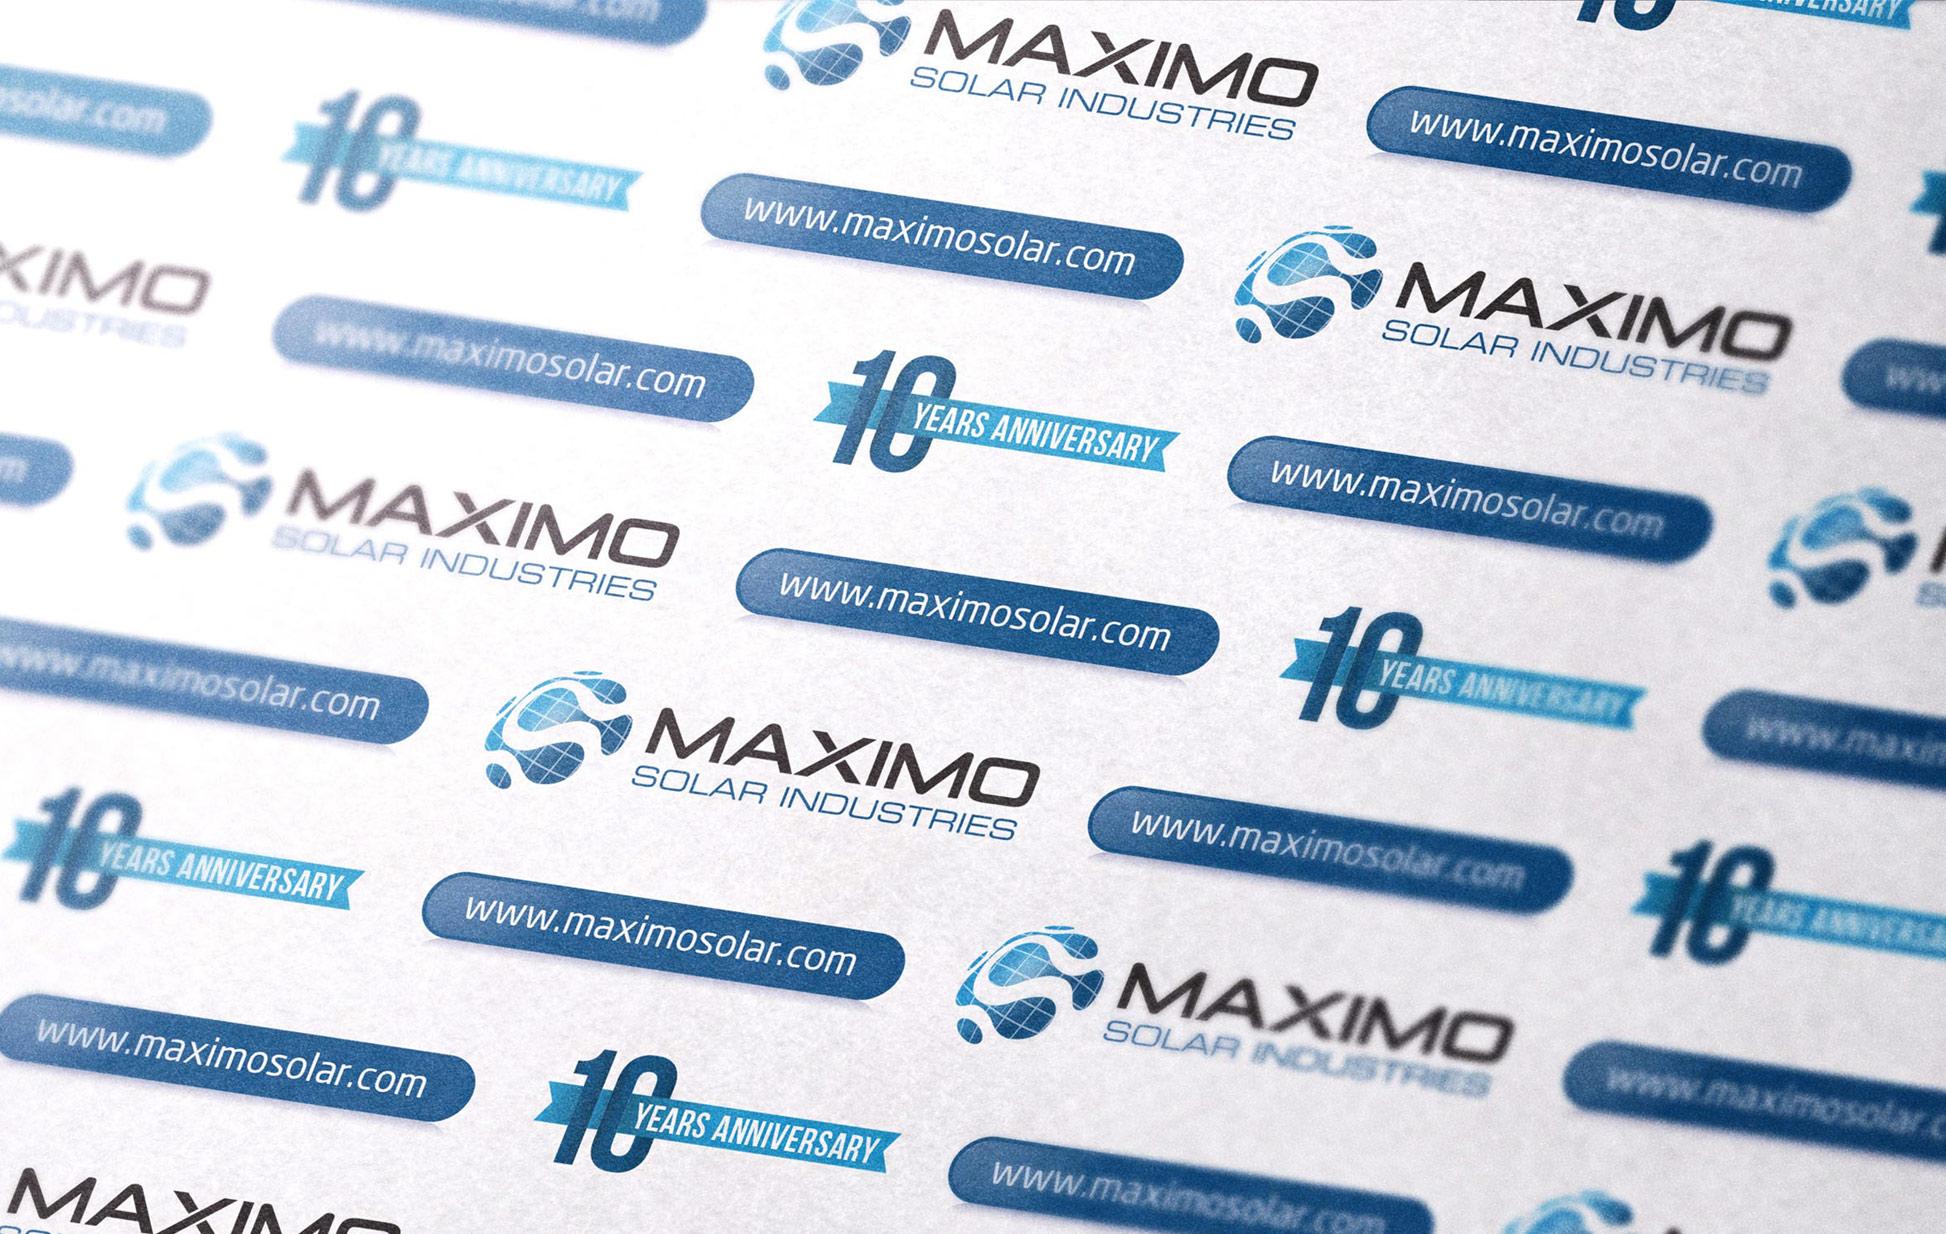 maximo solar industries - usa